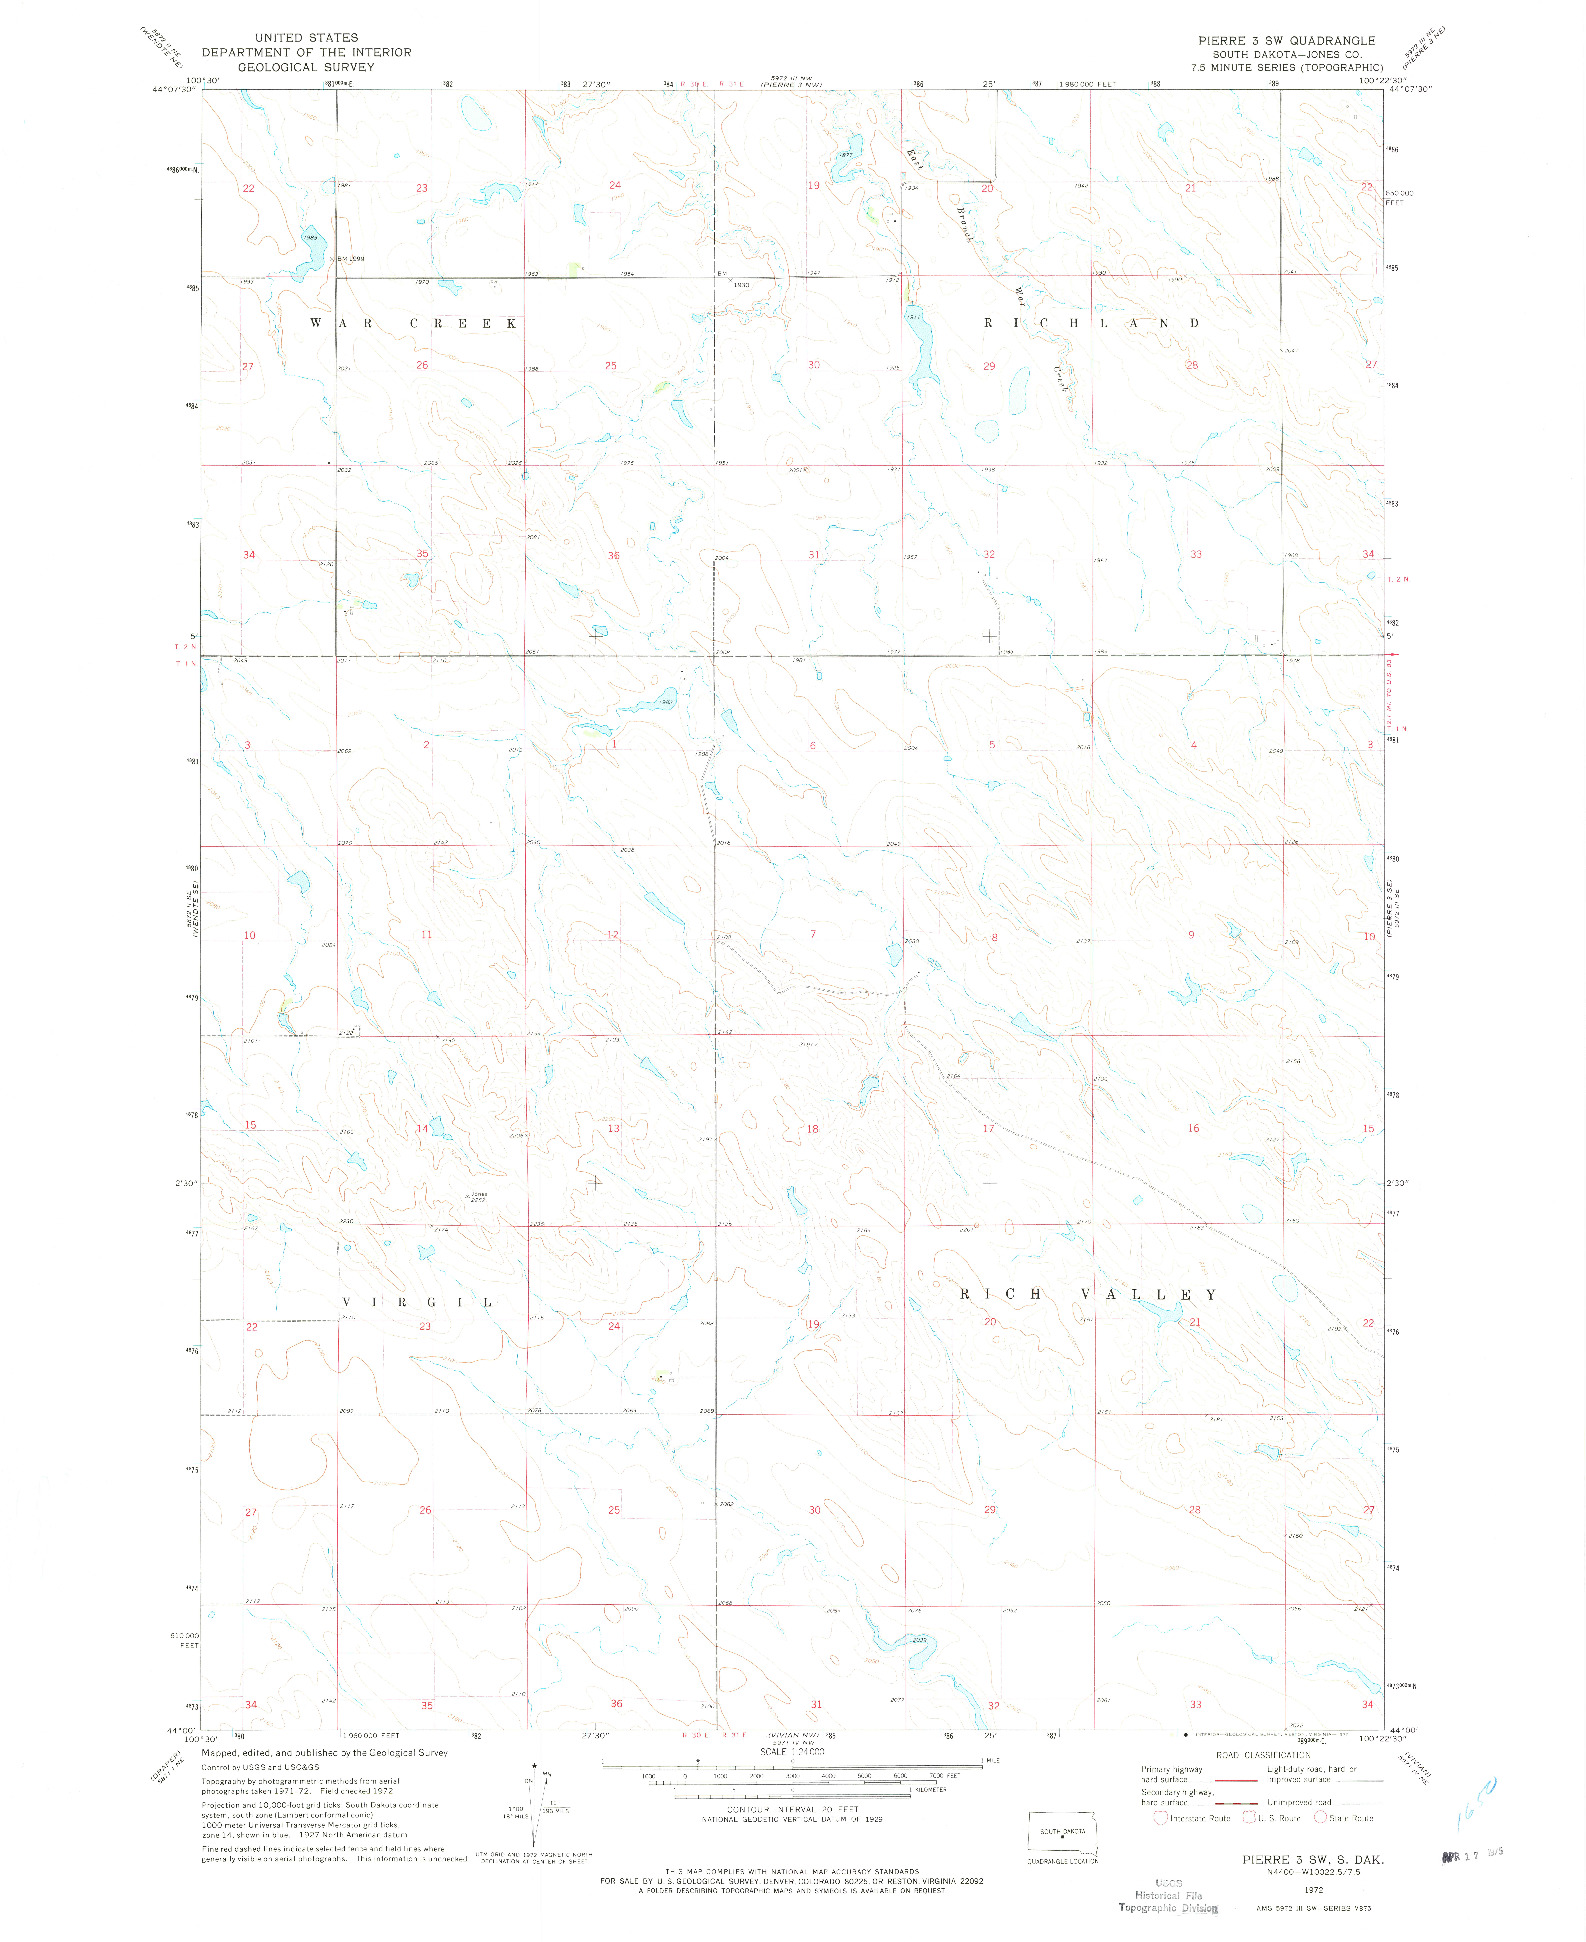 USGS 1:24000-SCALE QUADRANGLE FOR PIERRE 3 SW, SD 1972